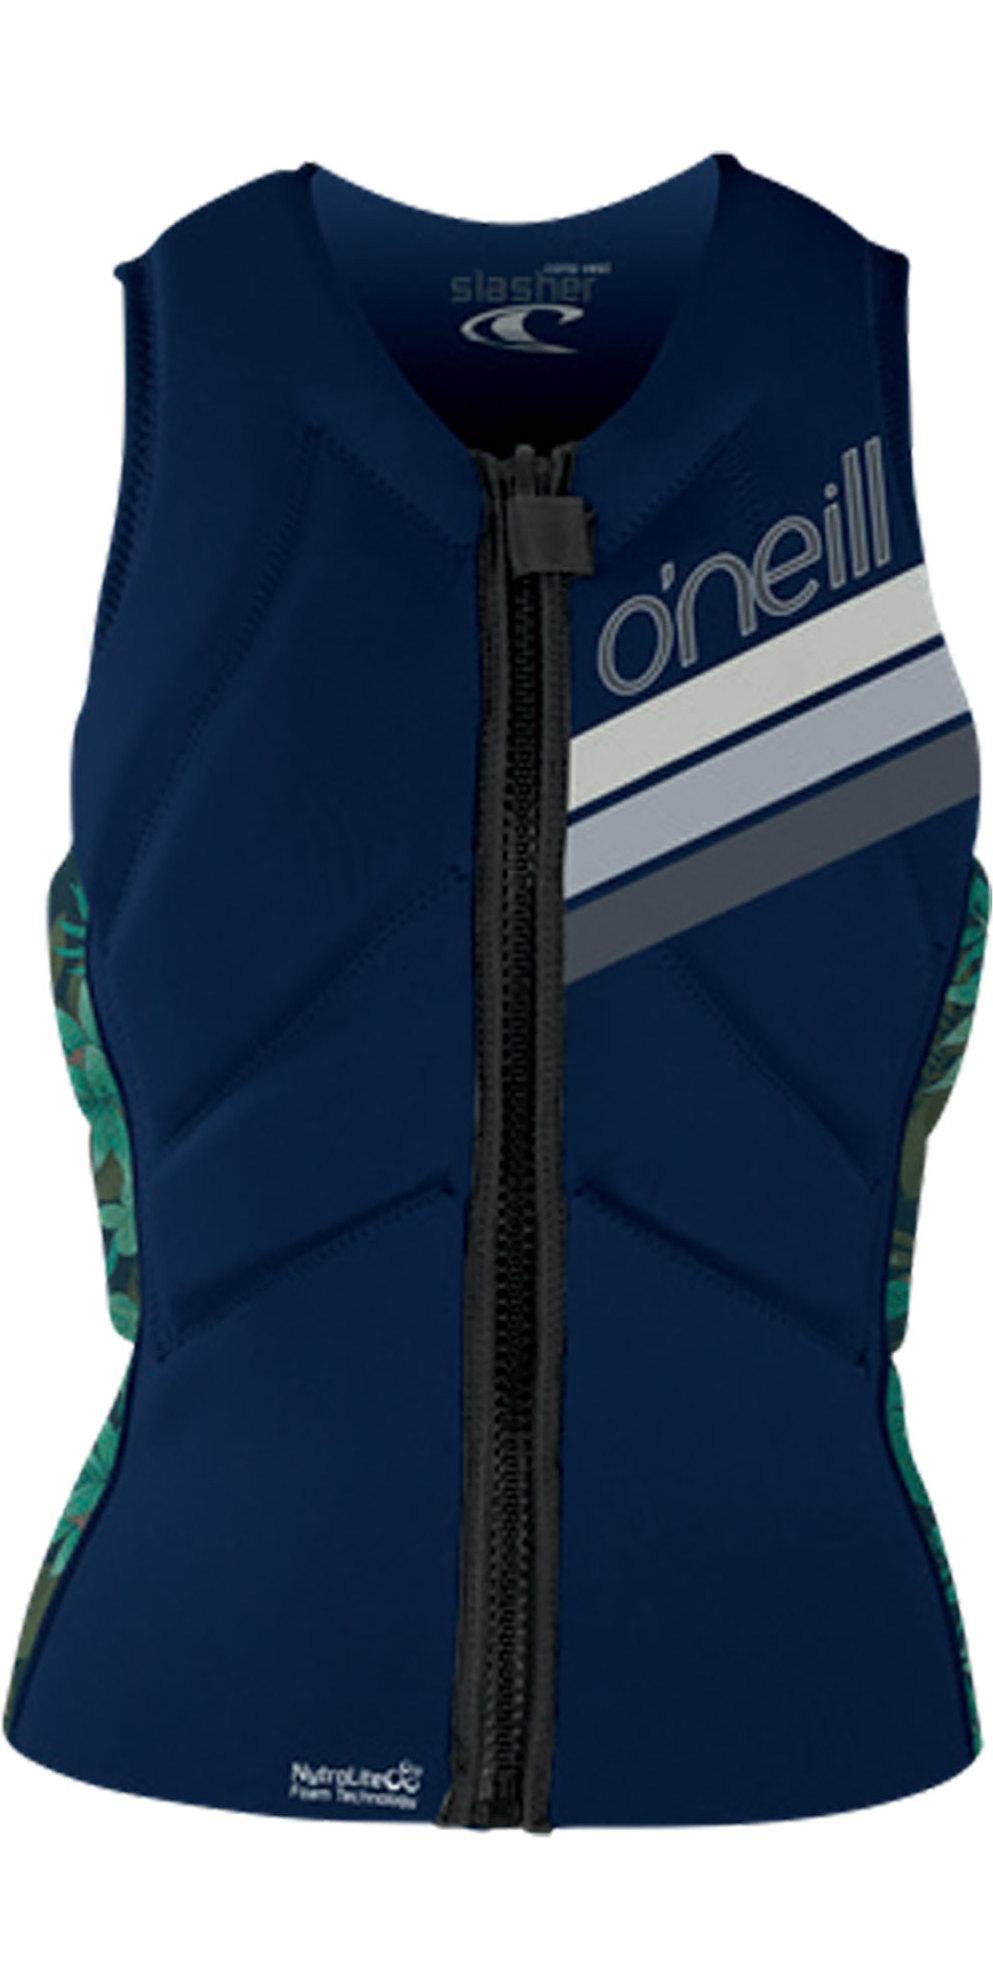 2019 O'Neill Womens Slasher Kite Impact Vest Abyss / Faro 4943EU